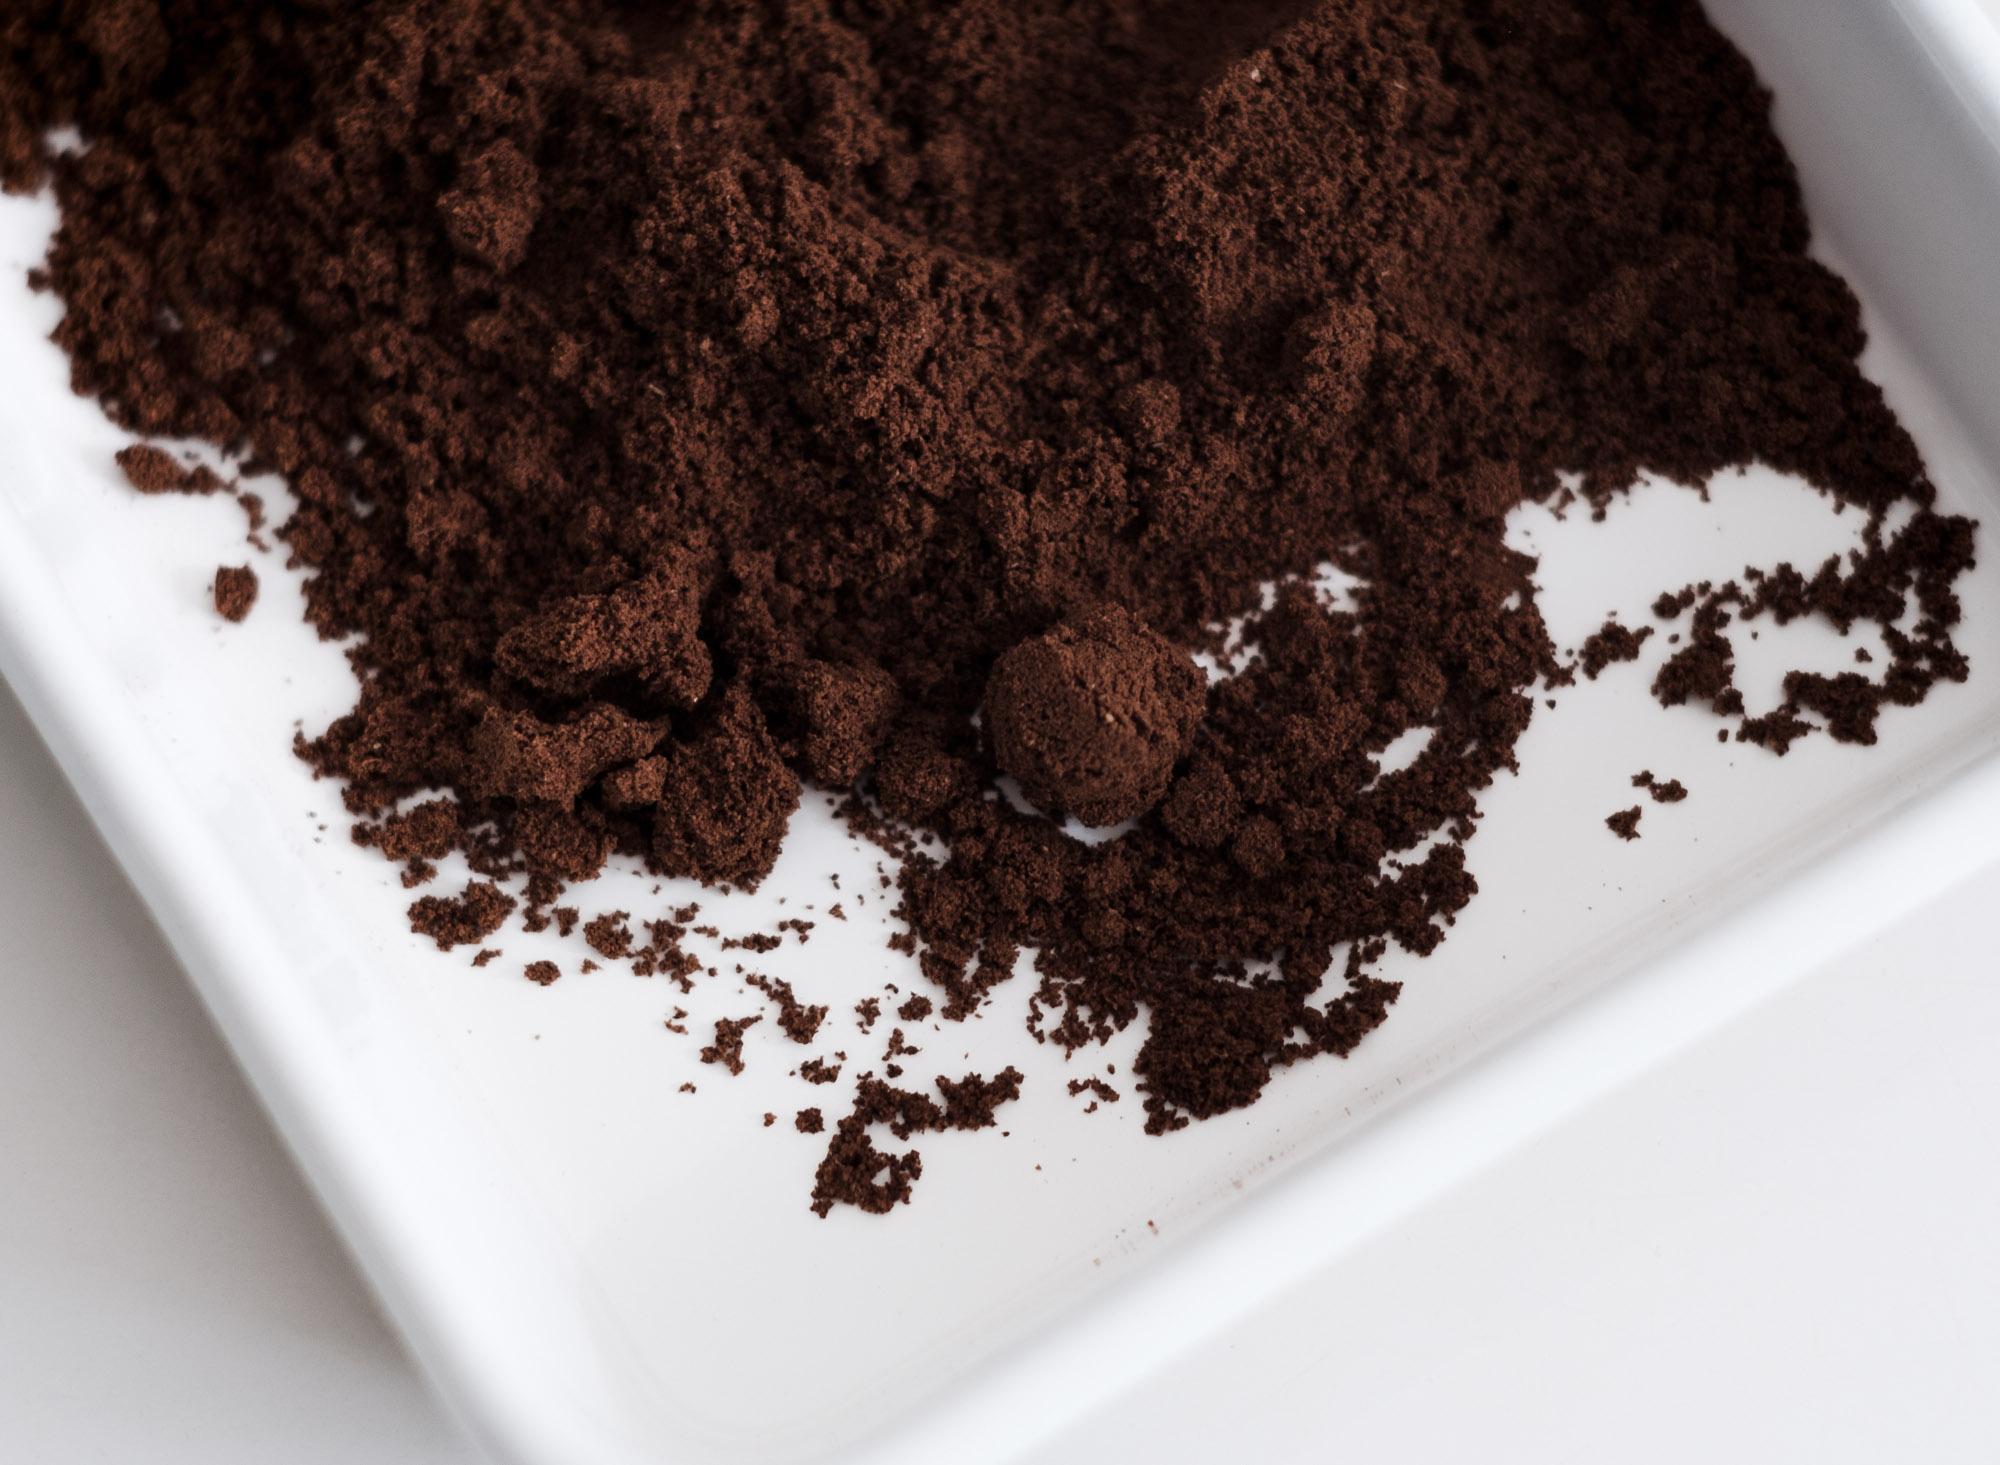 Xay ca phe cho Espresso - PrimeCoffee